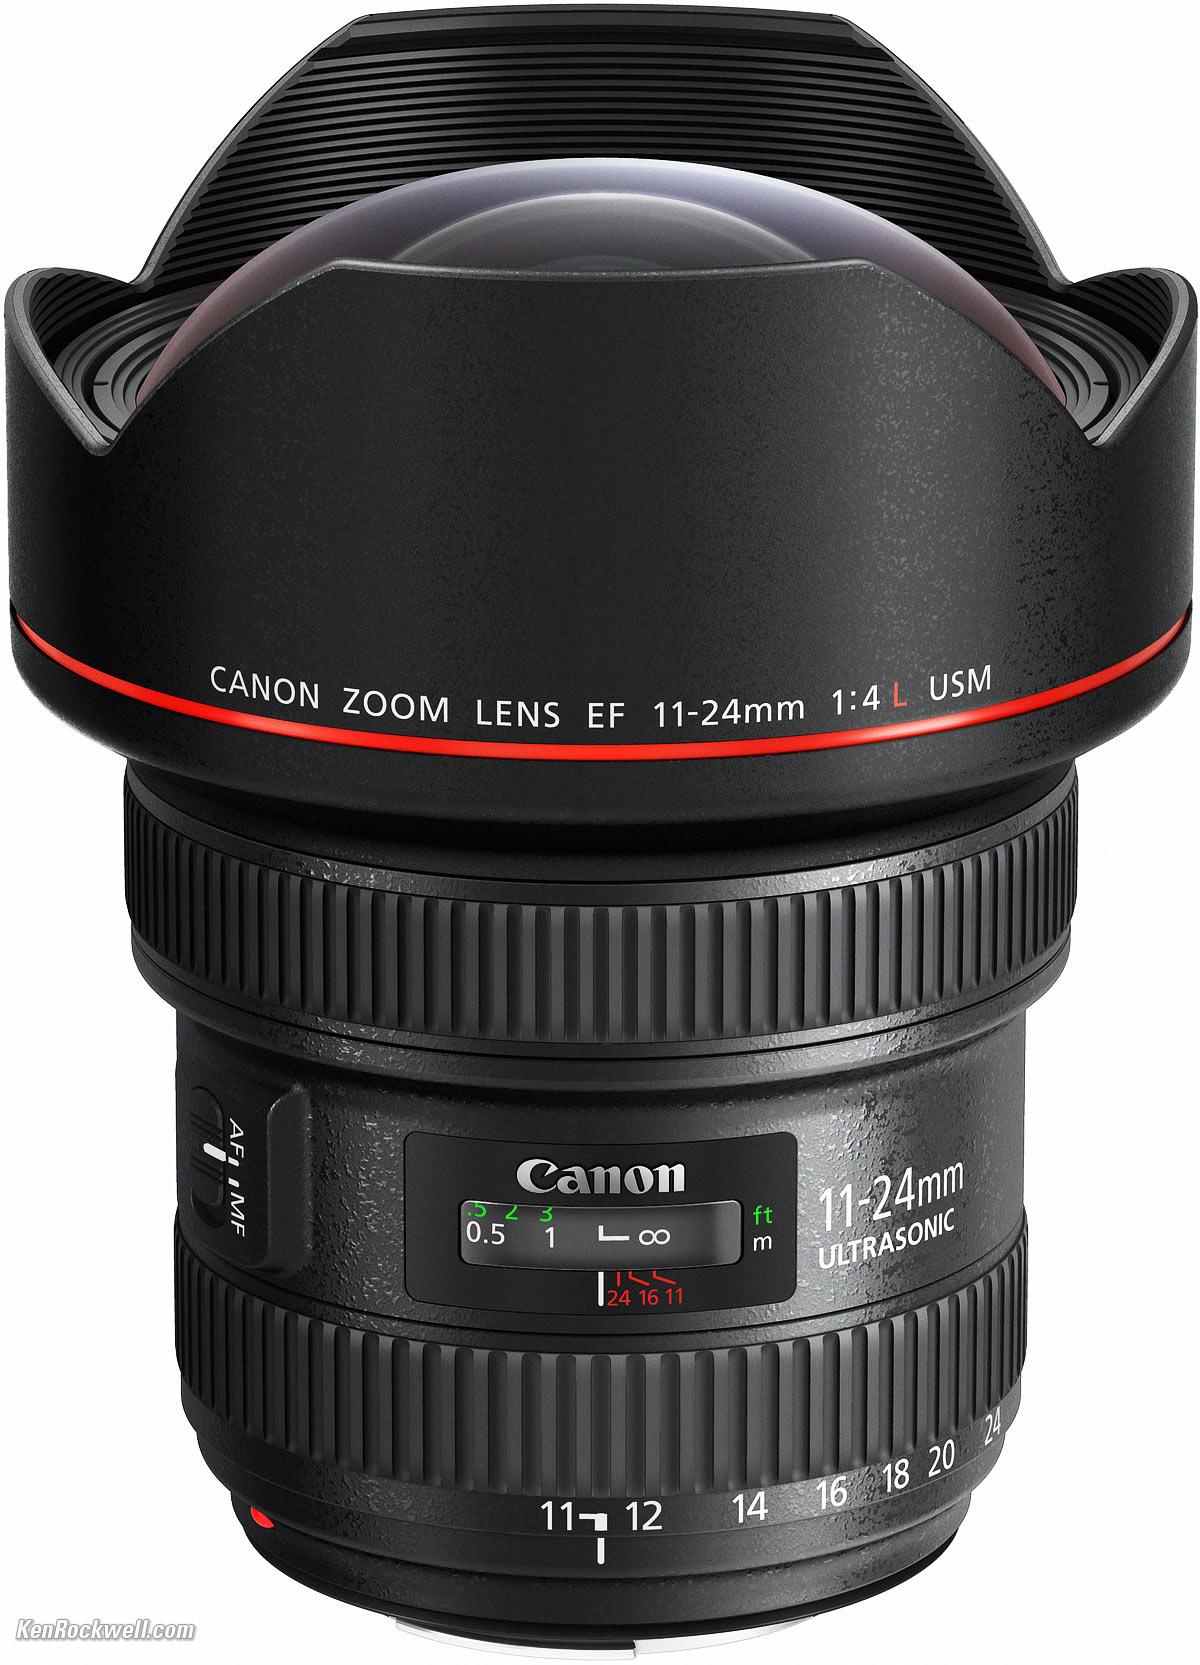 CANON 11-24 MM LENS F/4 L Image